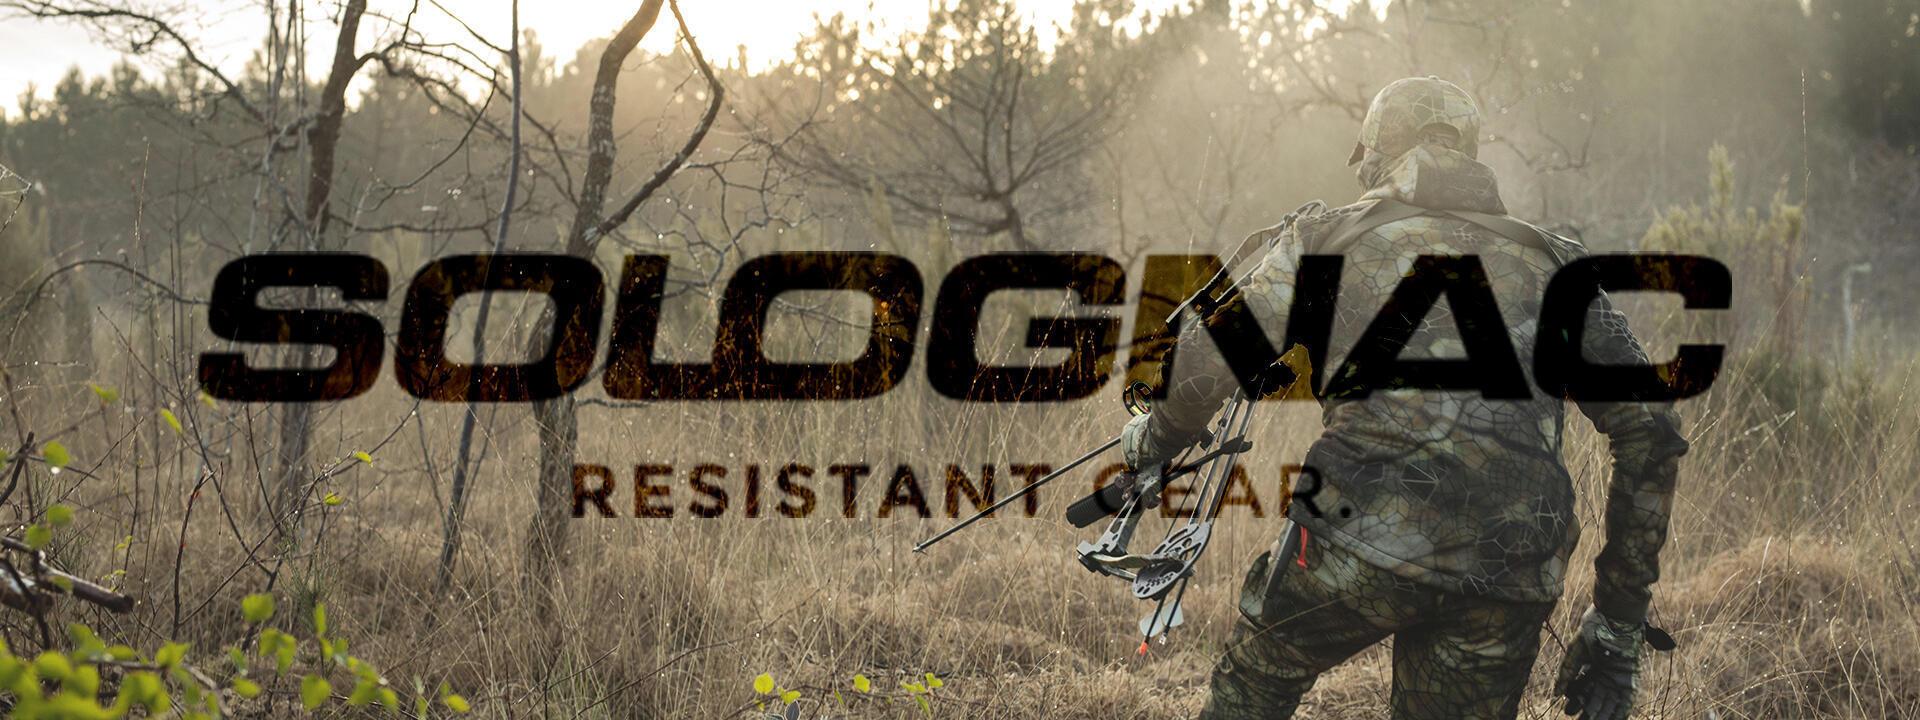 Solognac resistant gear-La marque de chasse de Décathlon